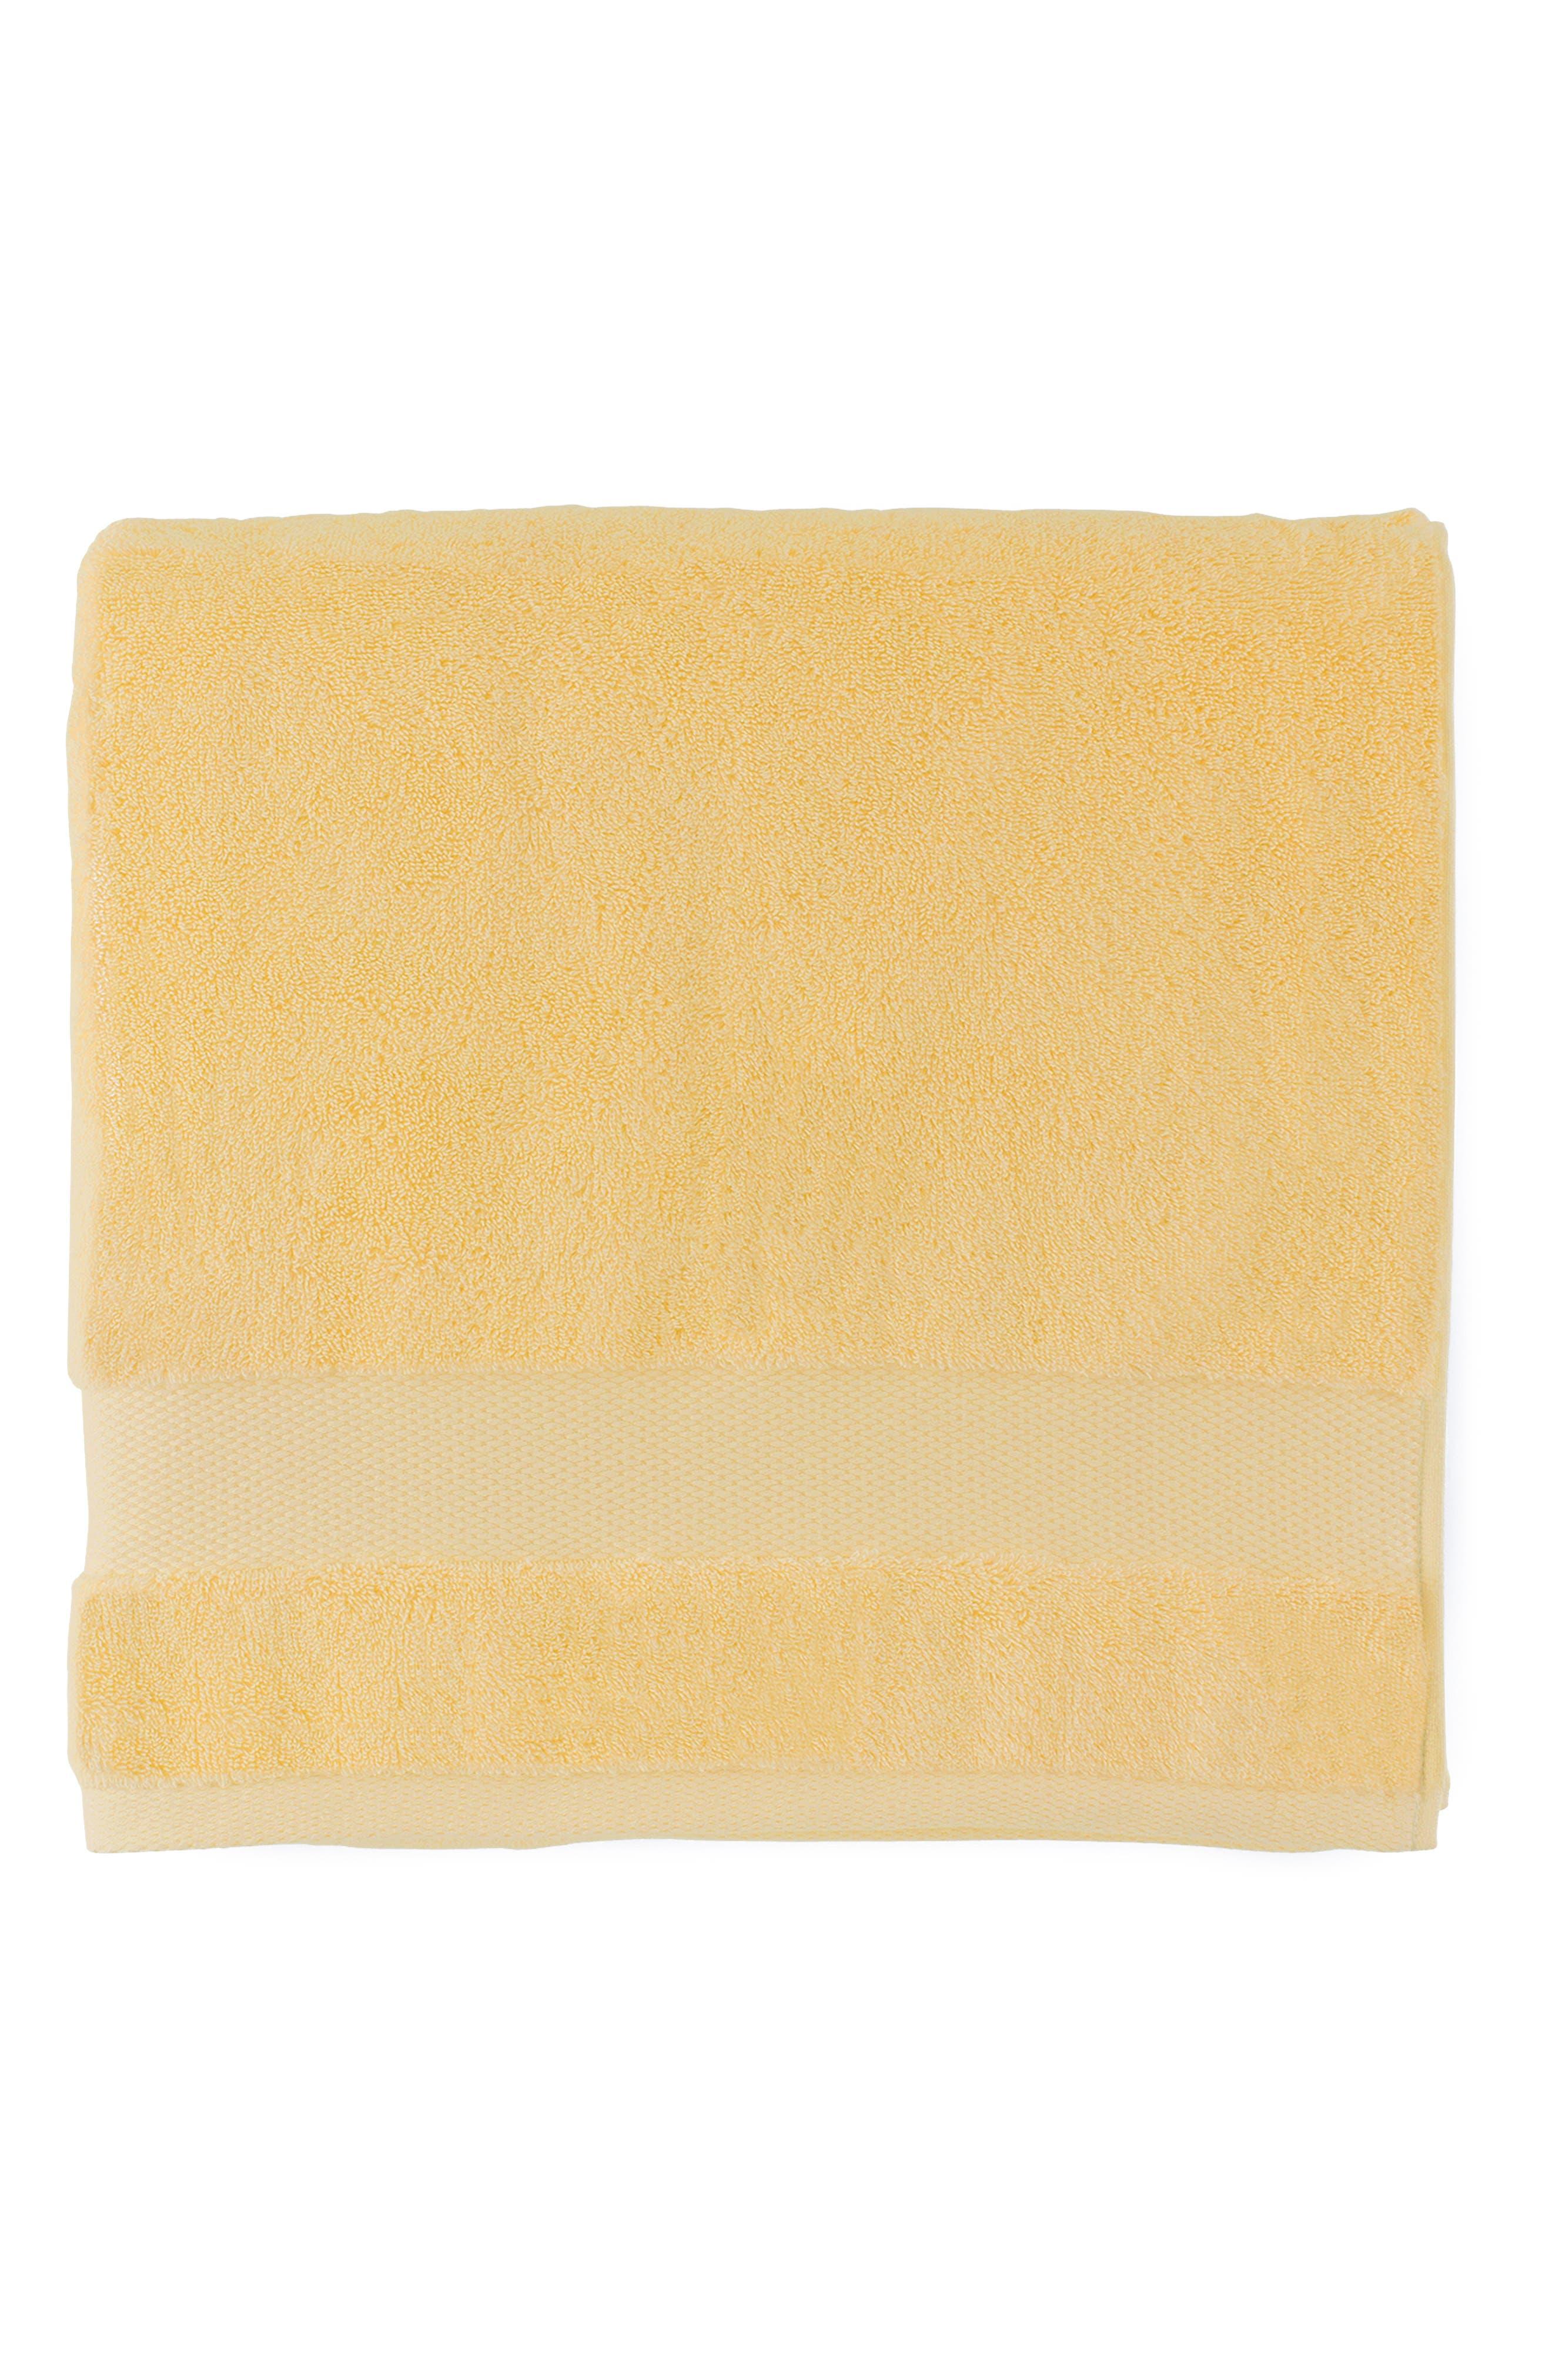 Bello Hand Towel,                             Main thumbnail 1, color,                             CORN